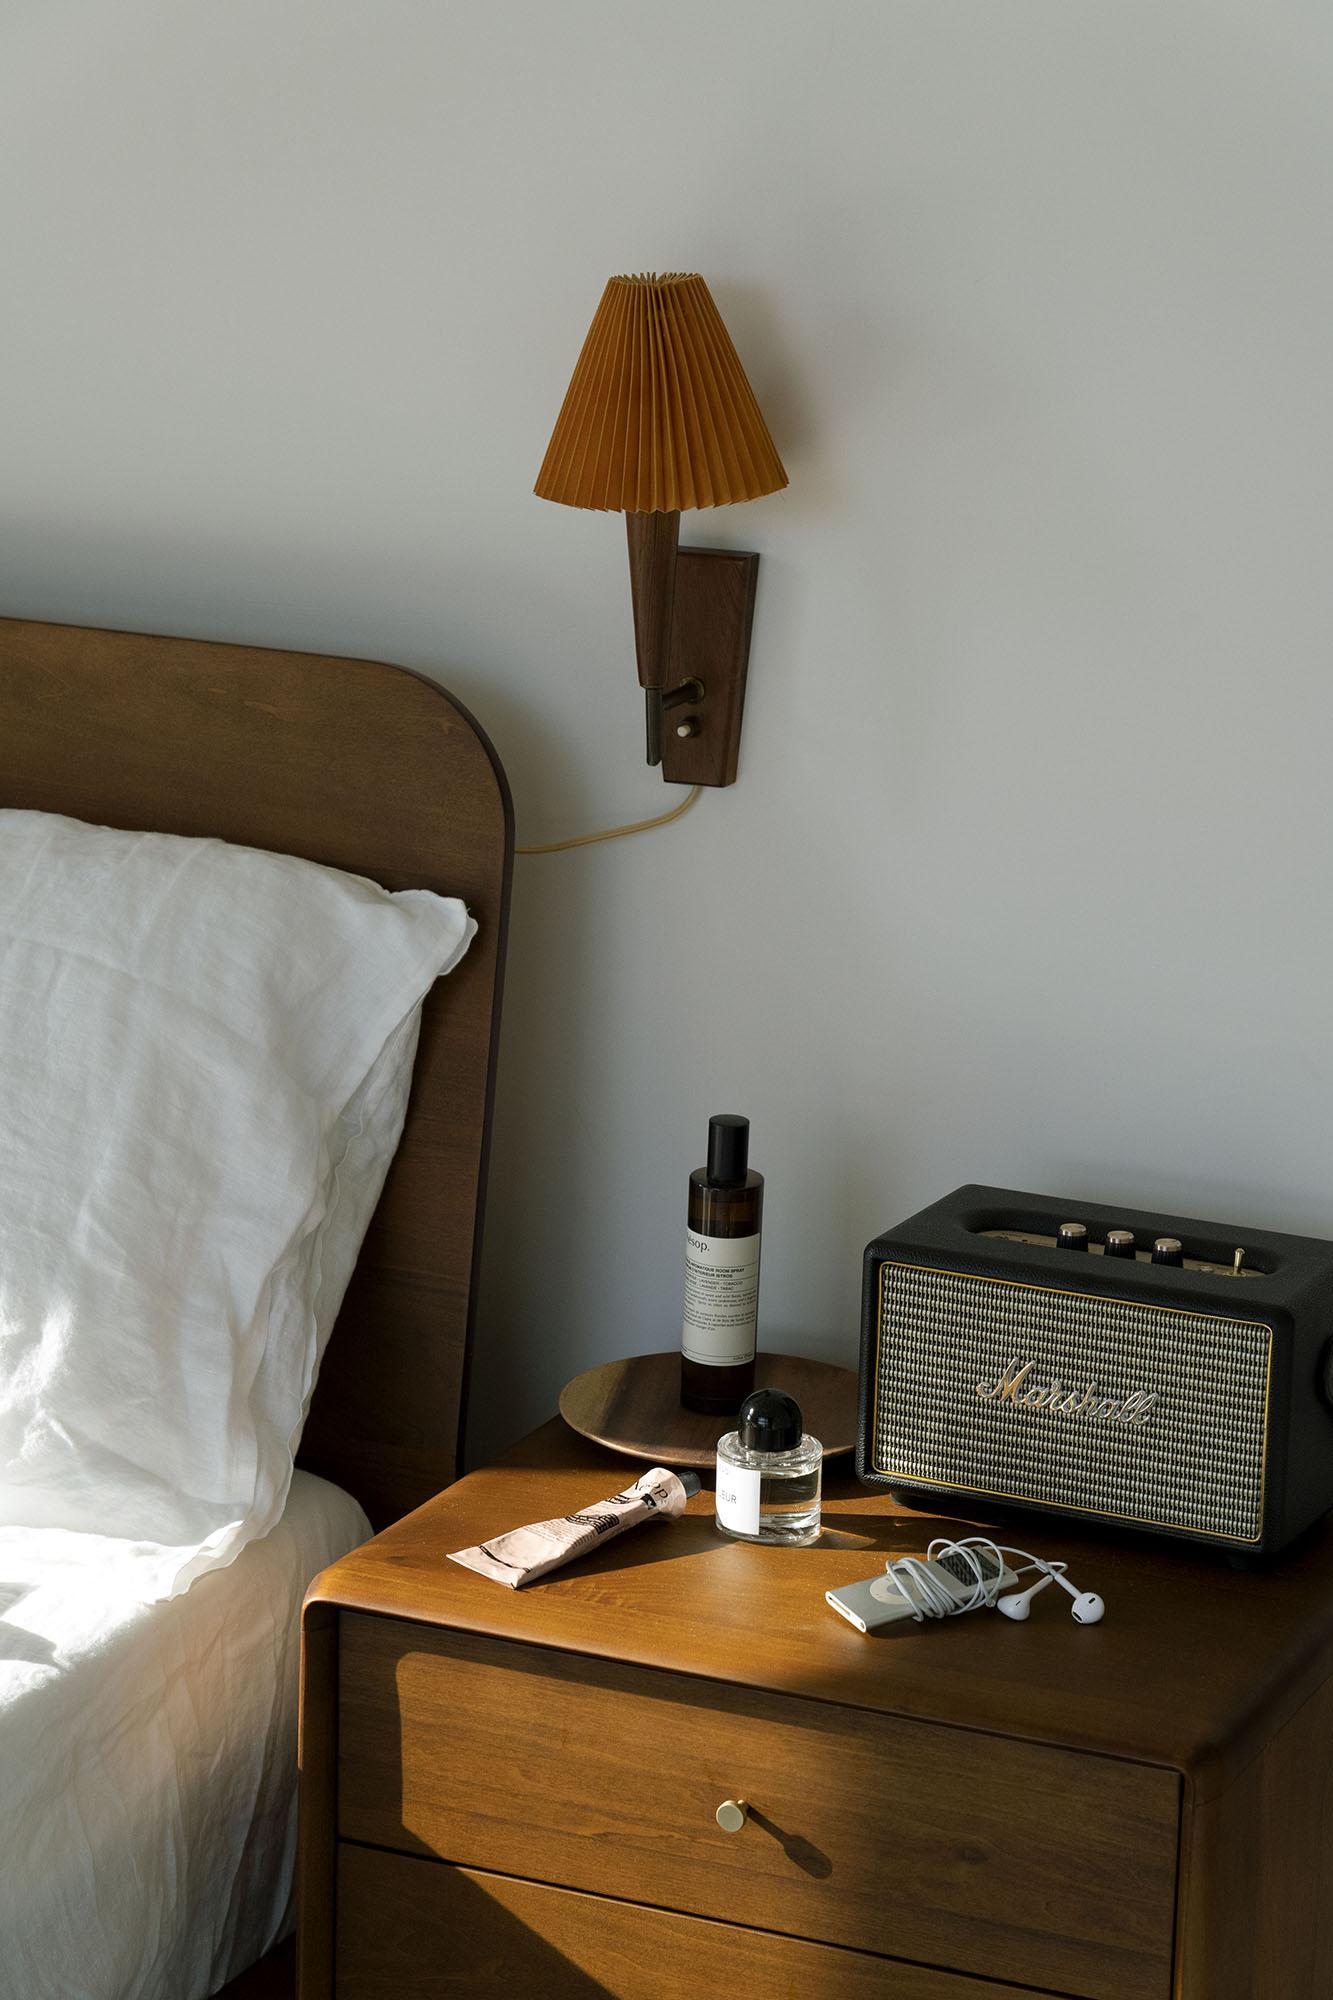 MR. LIVING 居家先生 床墊|讓家每天都像入住喜歡的飯店一樣開心舒適